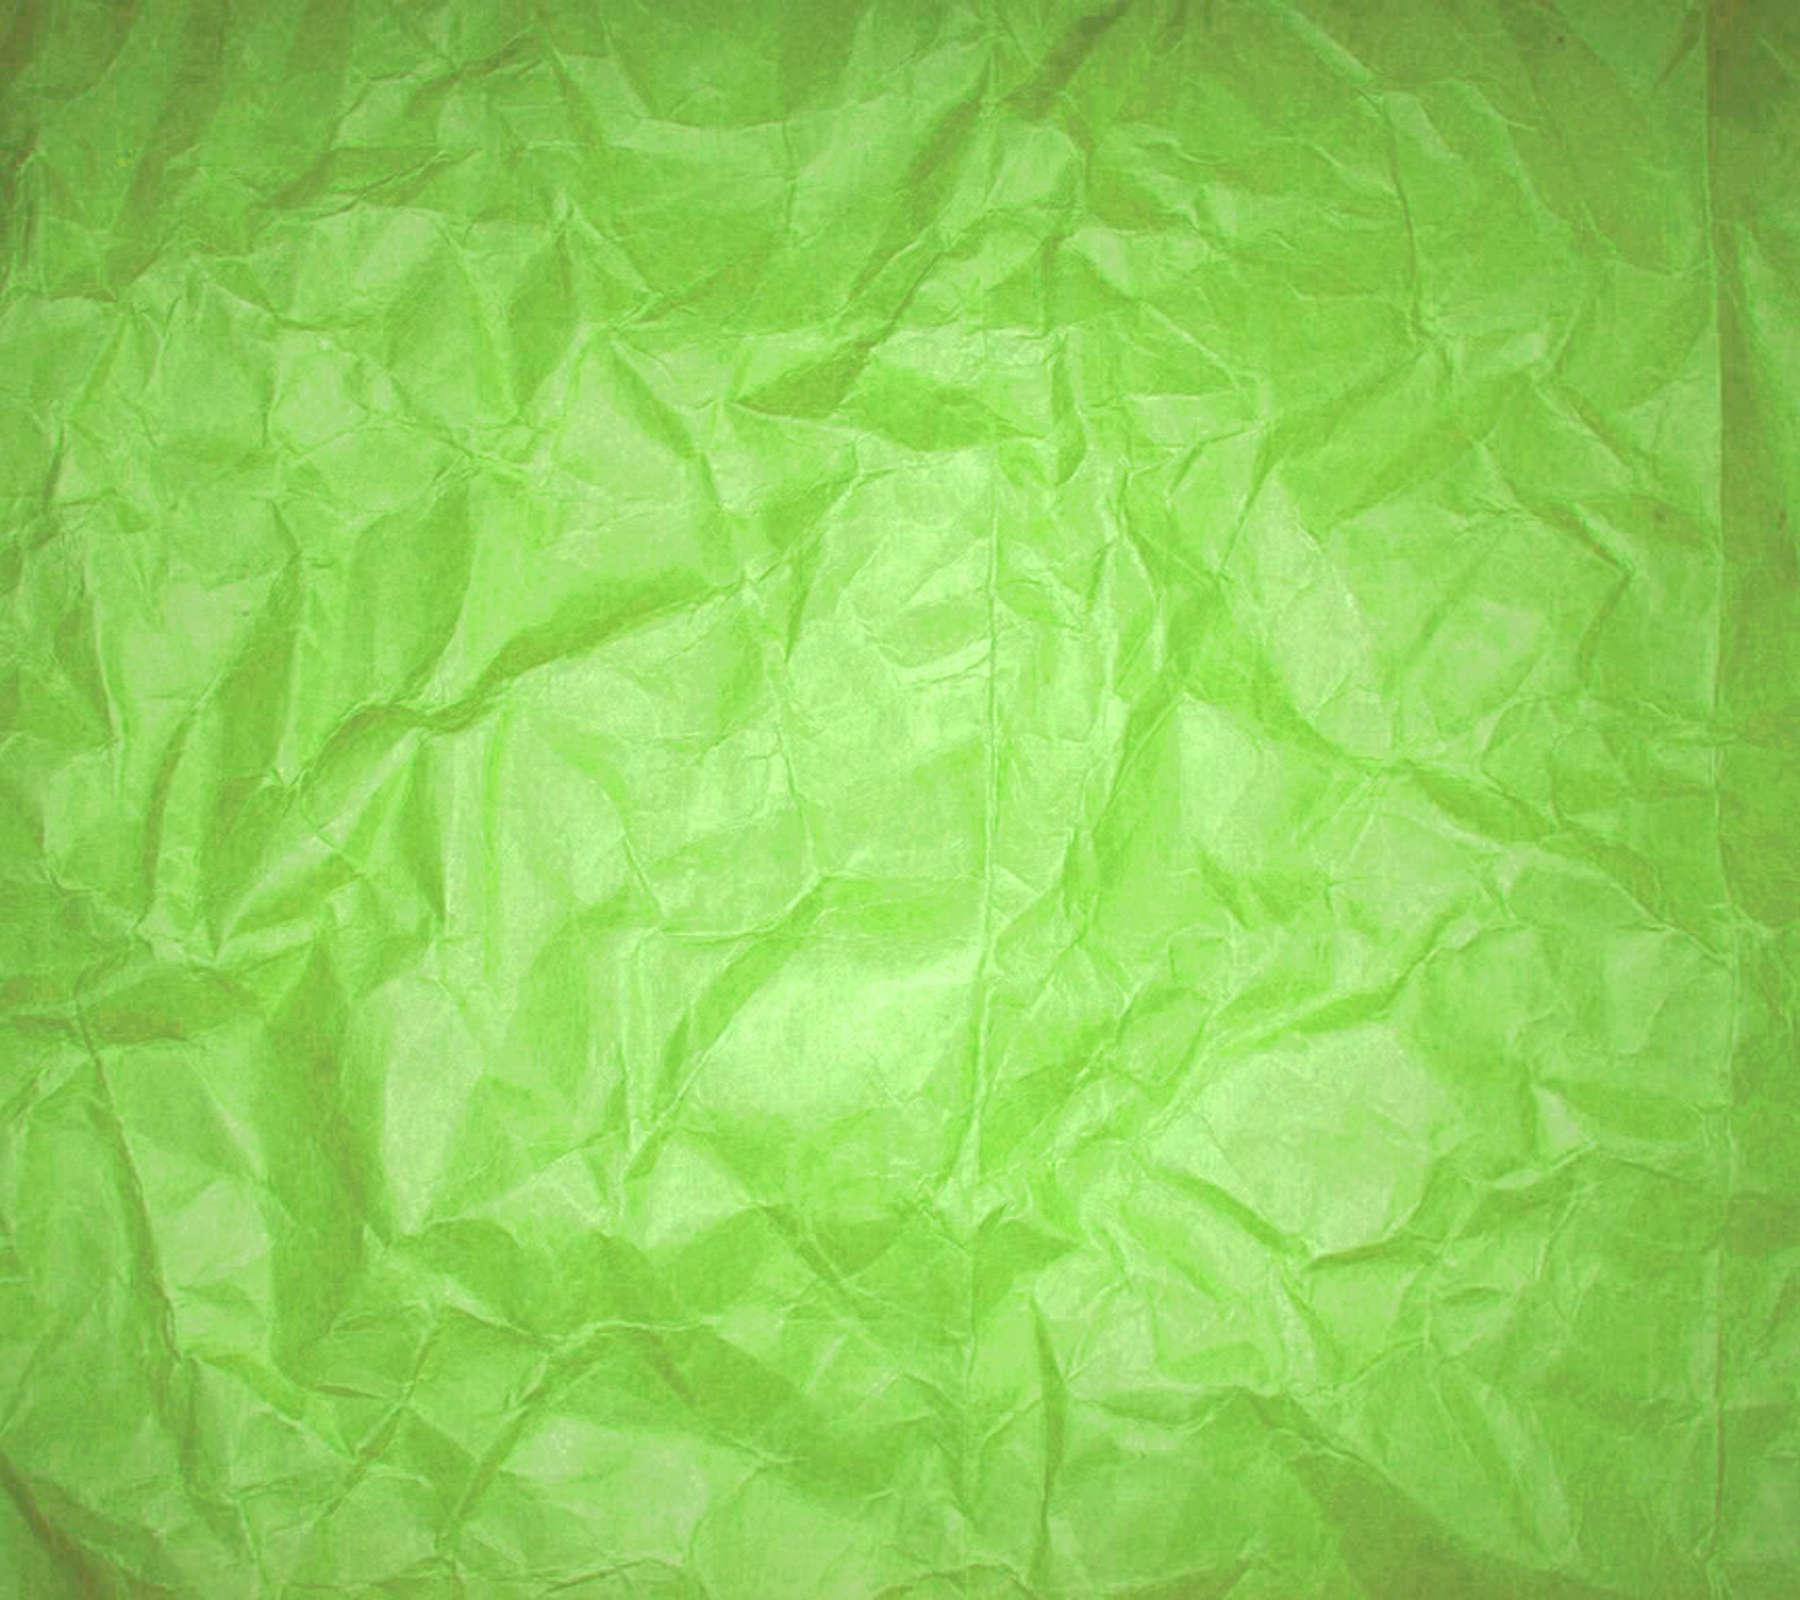 зеленая картинка на бумаге